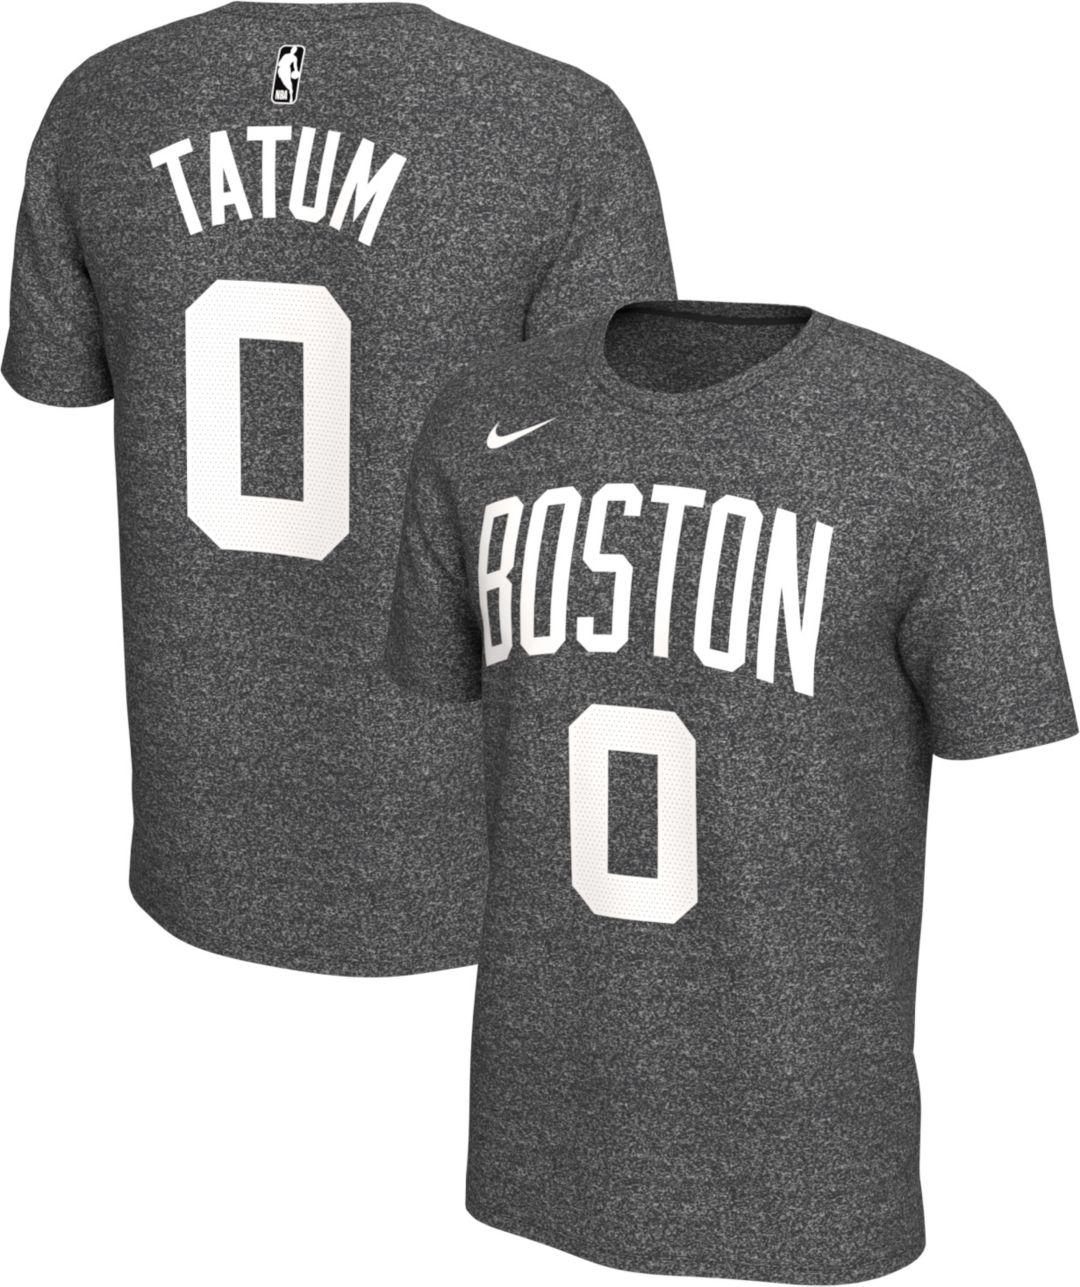 best website c8453 df8ce Nike Men's Boston Celtics Jayson Tatum #0 Dri-FIT Grey T-Shirt